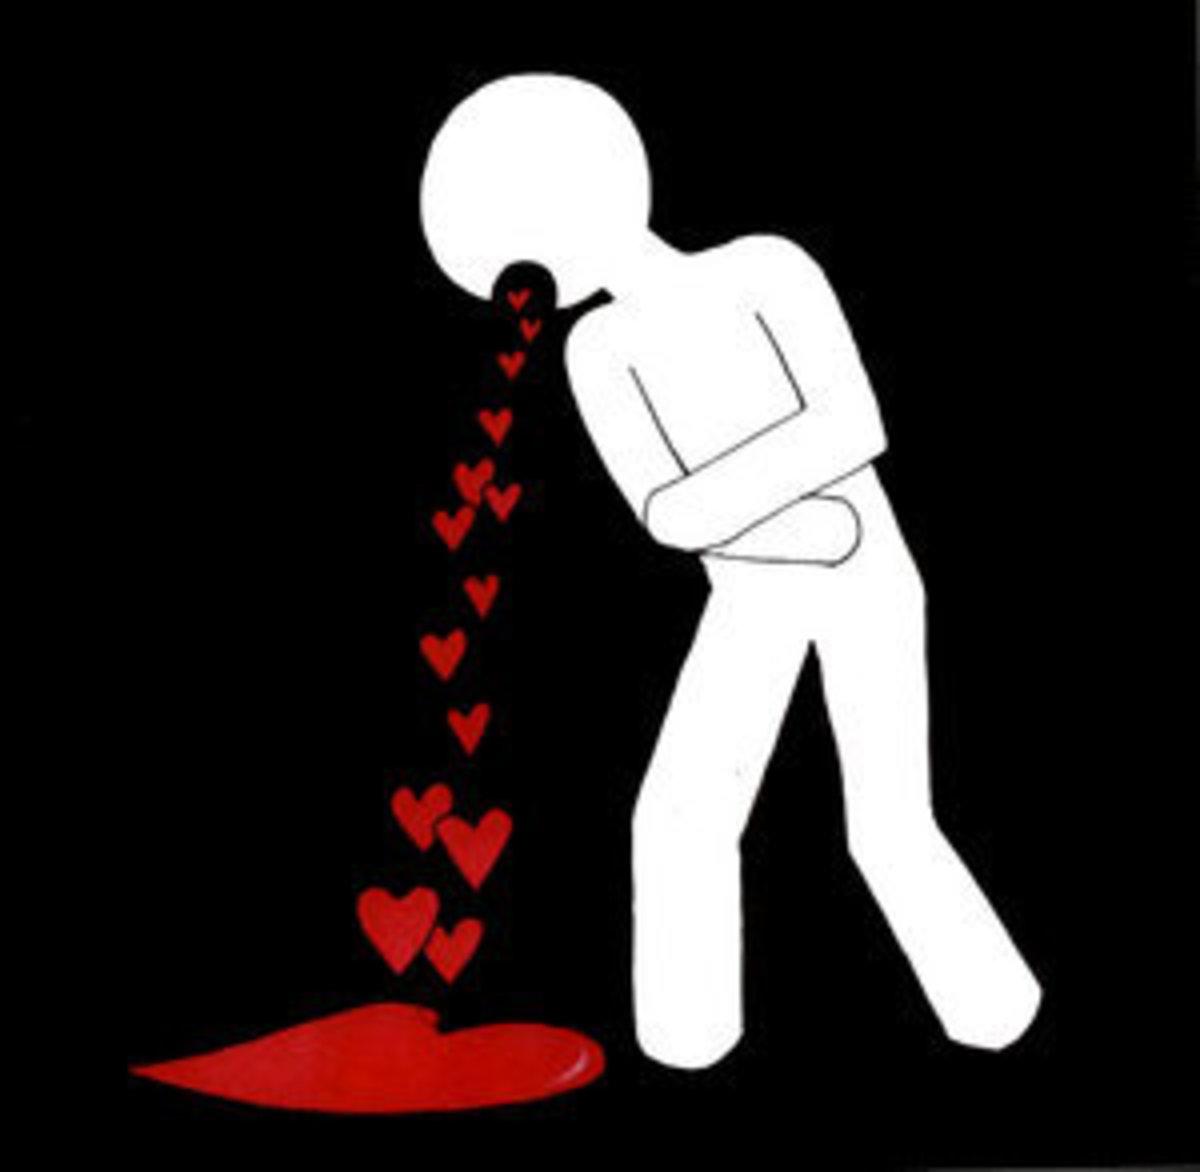 Unhealthy Love